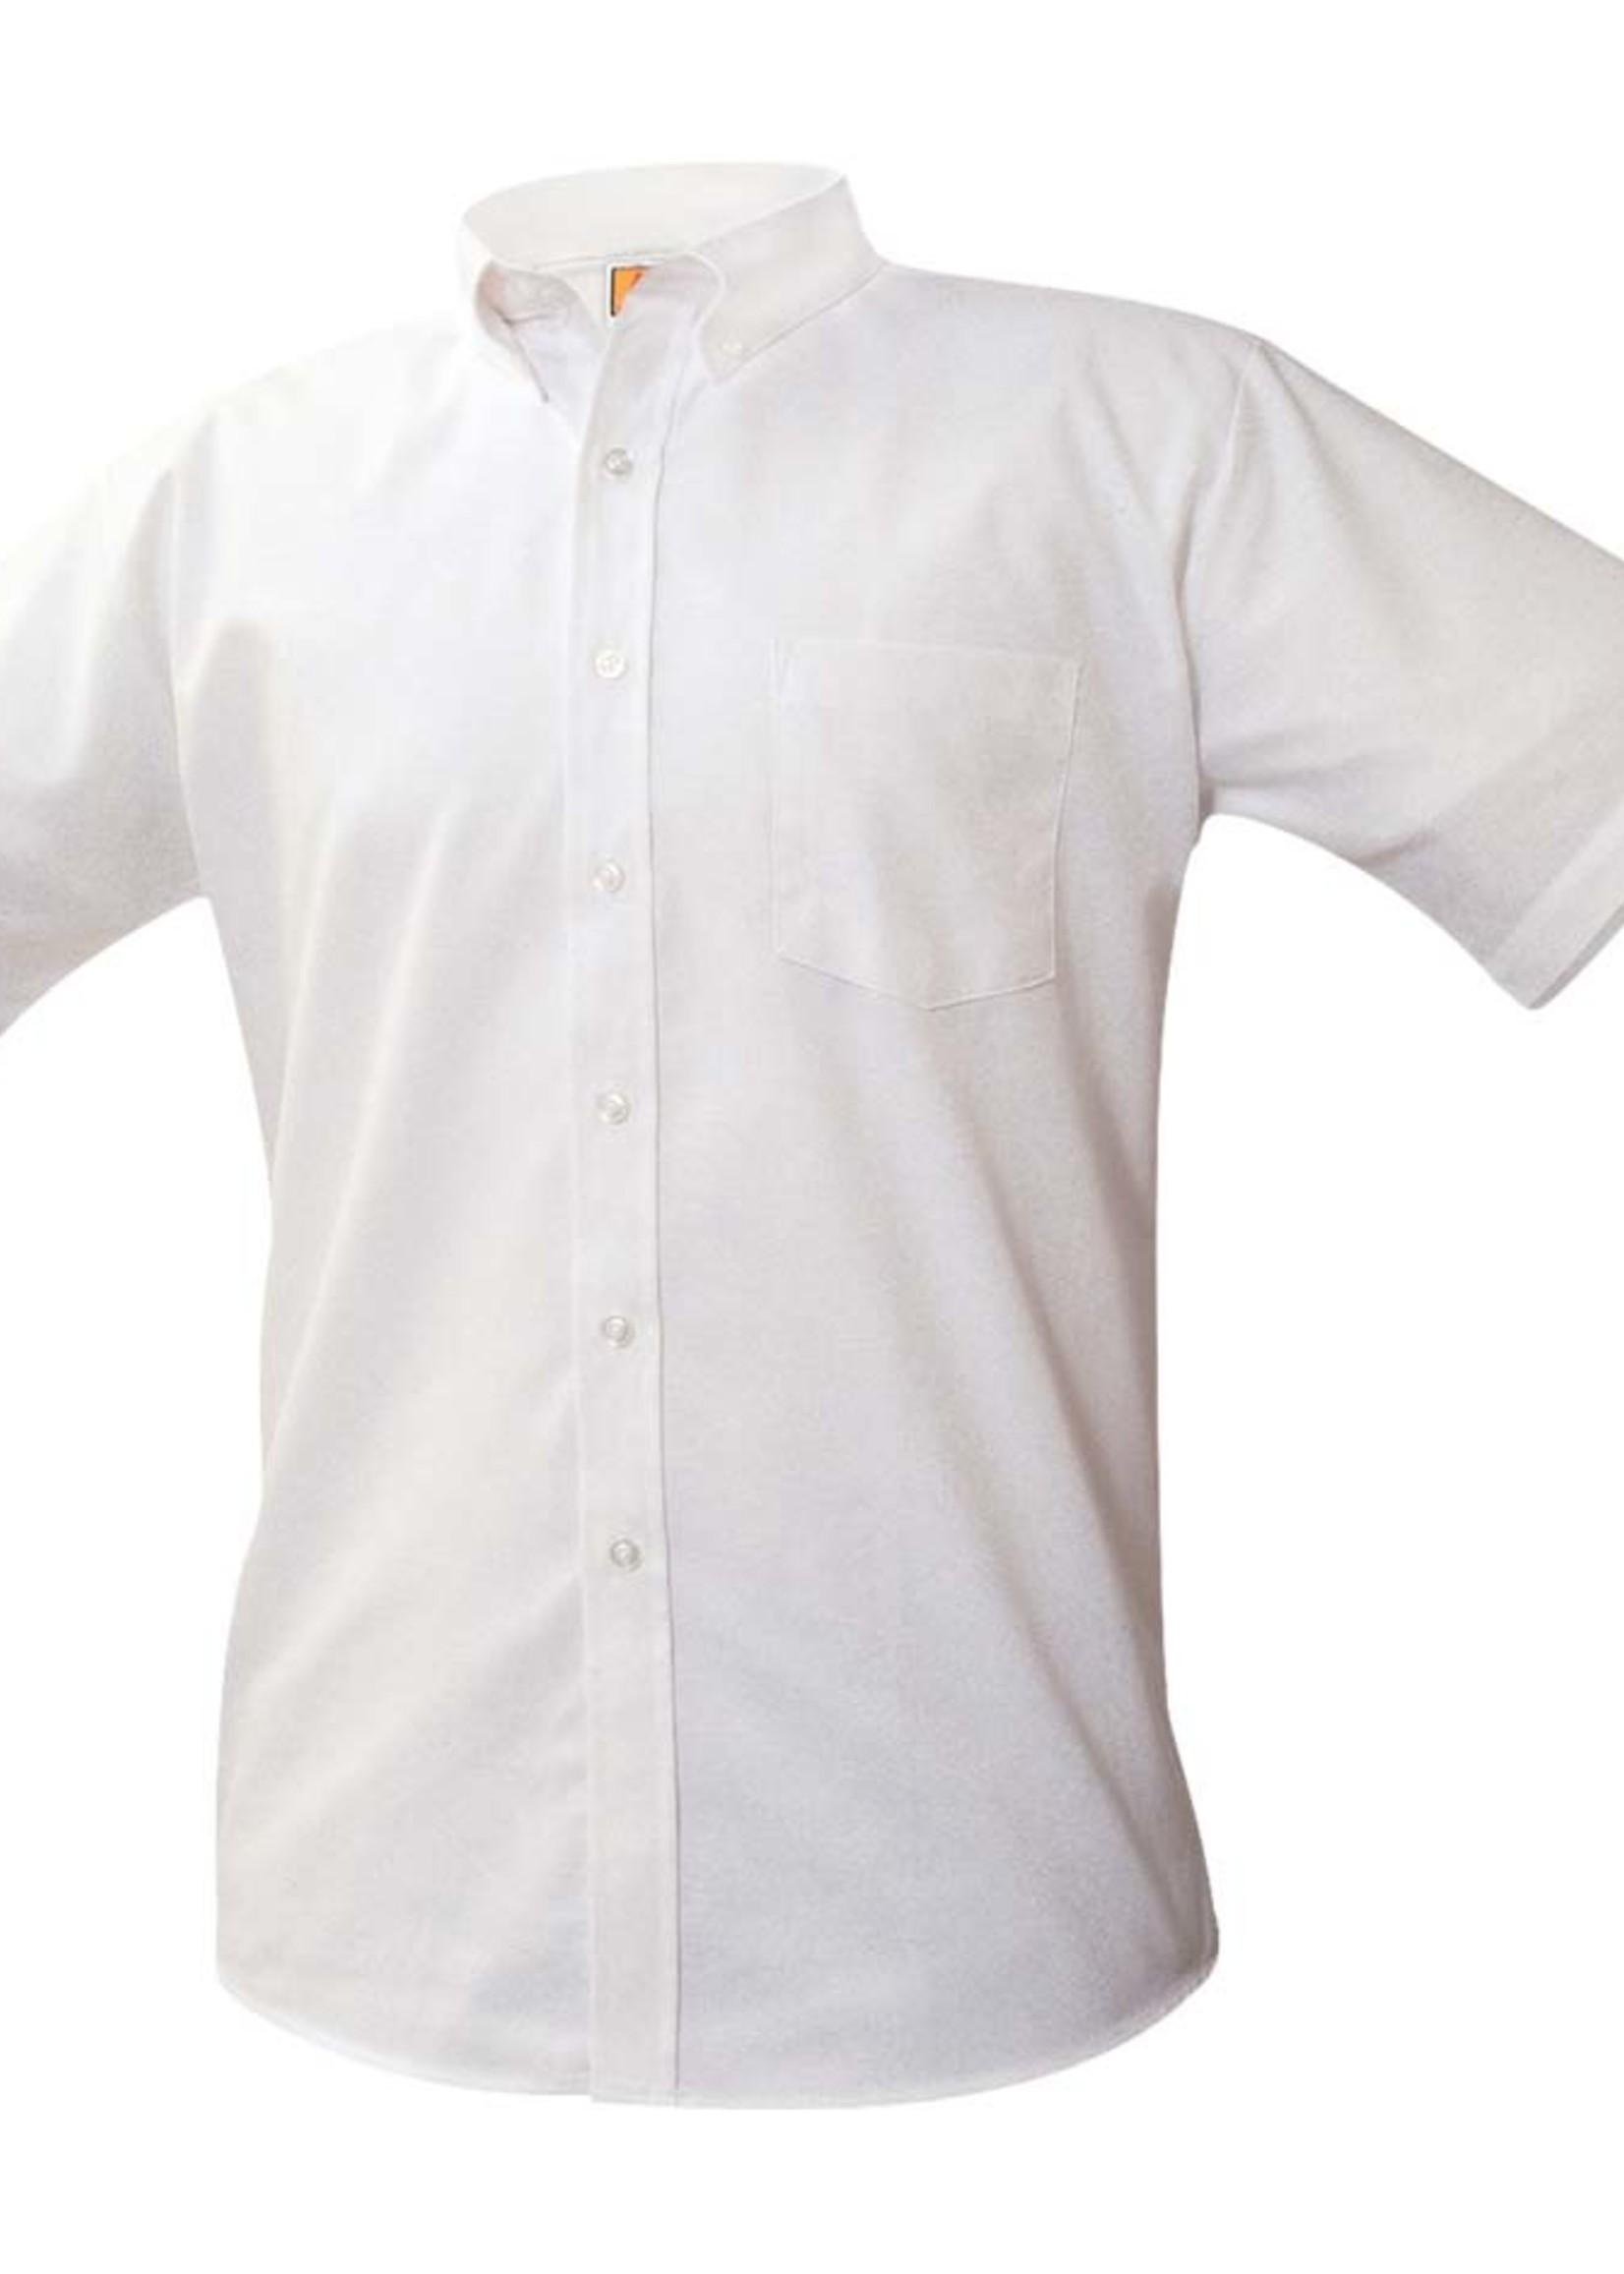 TUS RLCS White Short Sleeve Oxford Shirt